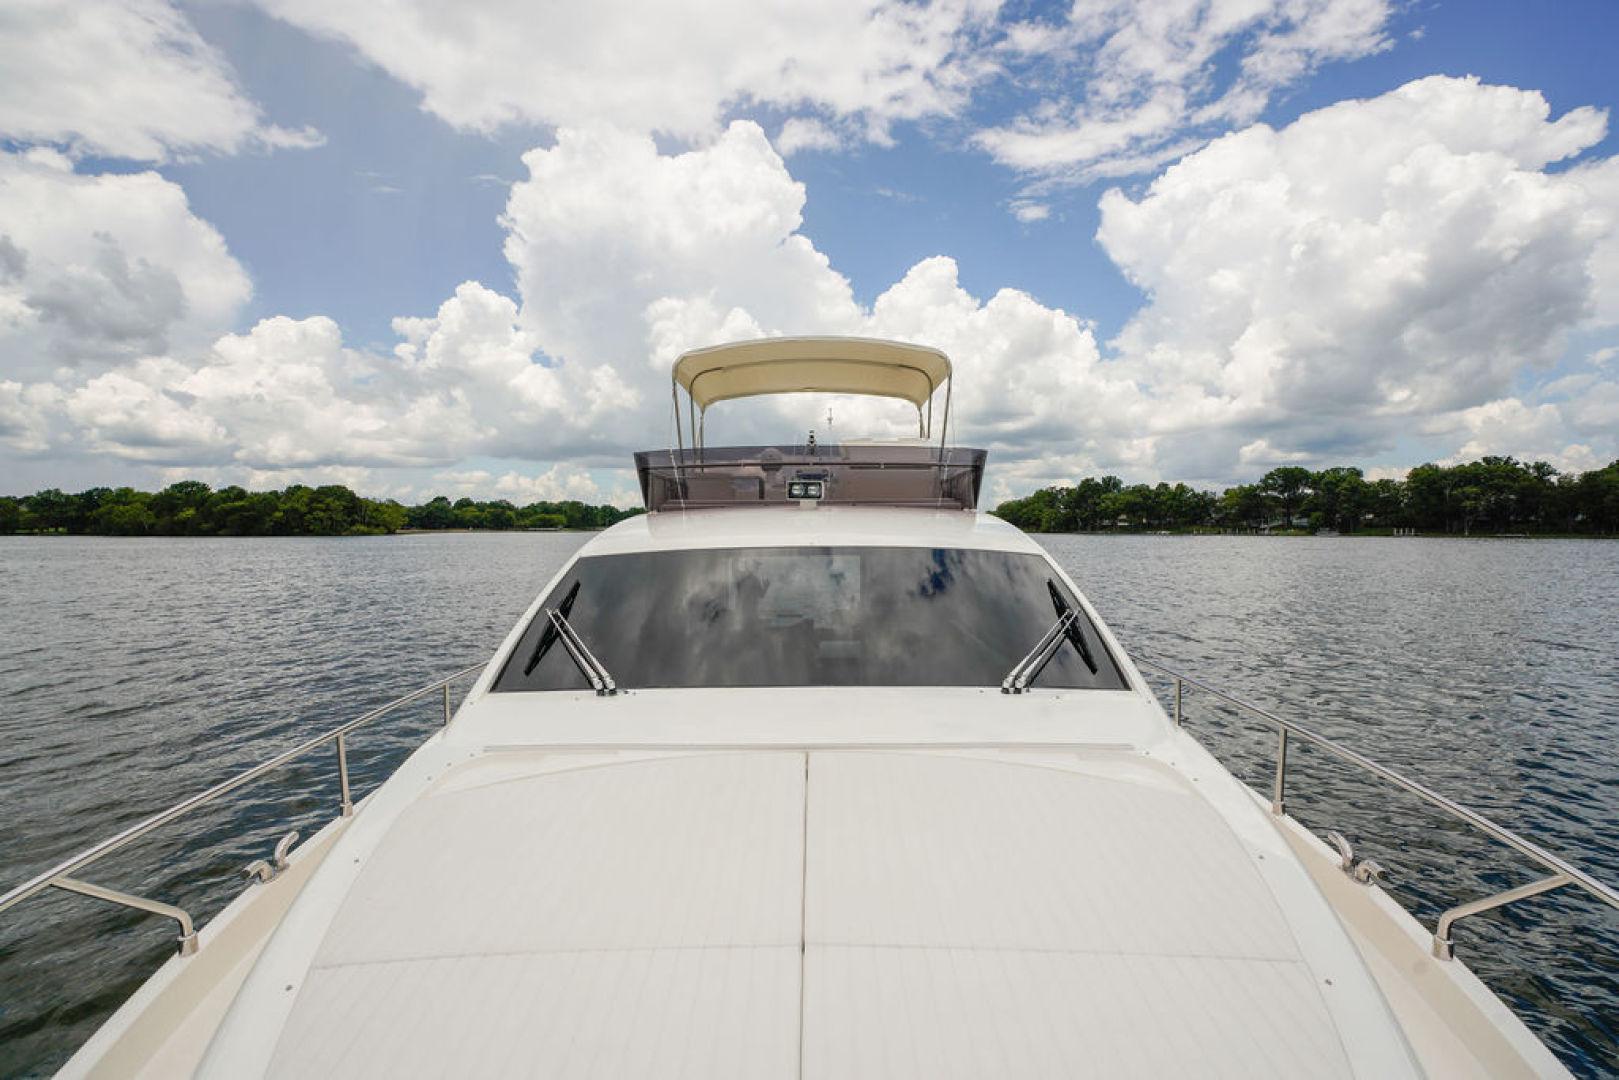 Ferretti Yachts-530 2013-ISLAND GIRL Mount Juliet-Tennessee-United States-1574679   Thumbnail